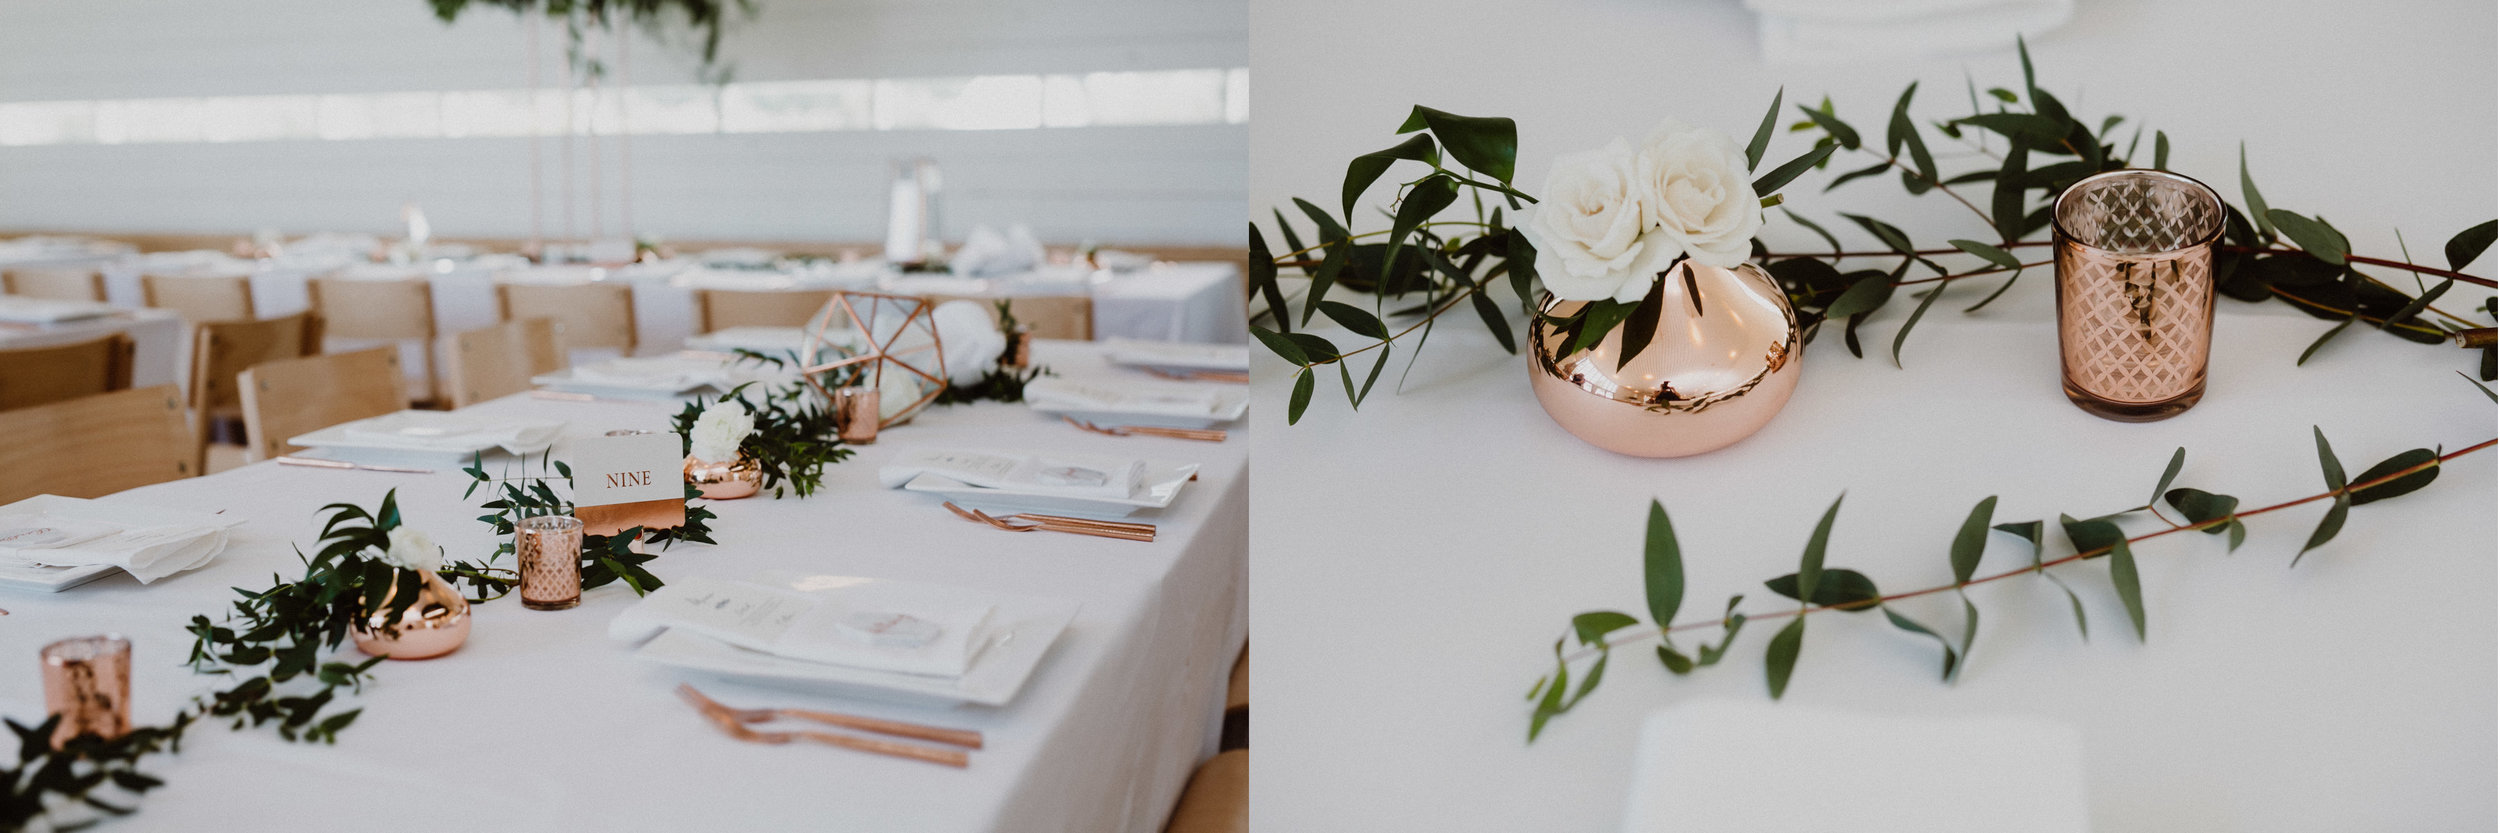 prospect-house-wedding-4.jpg